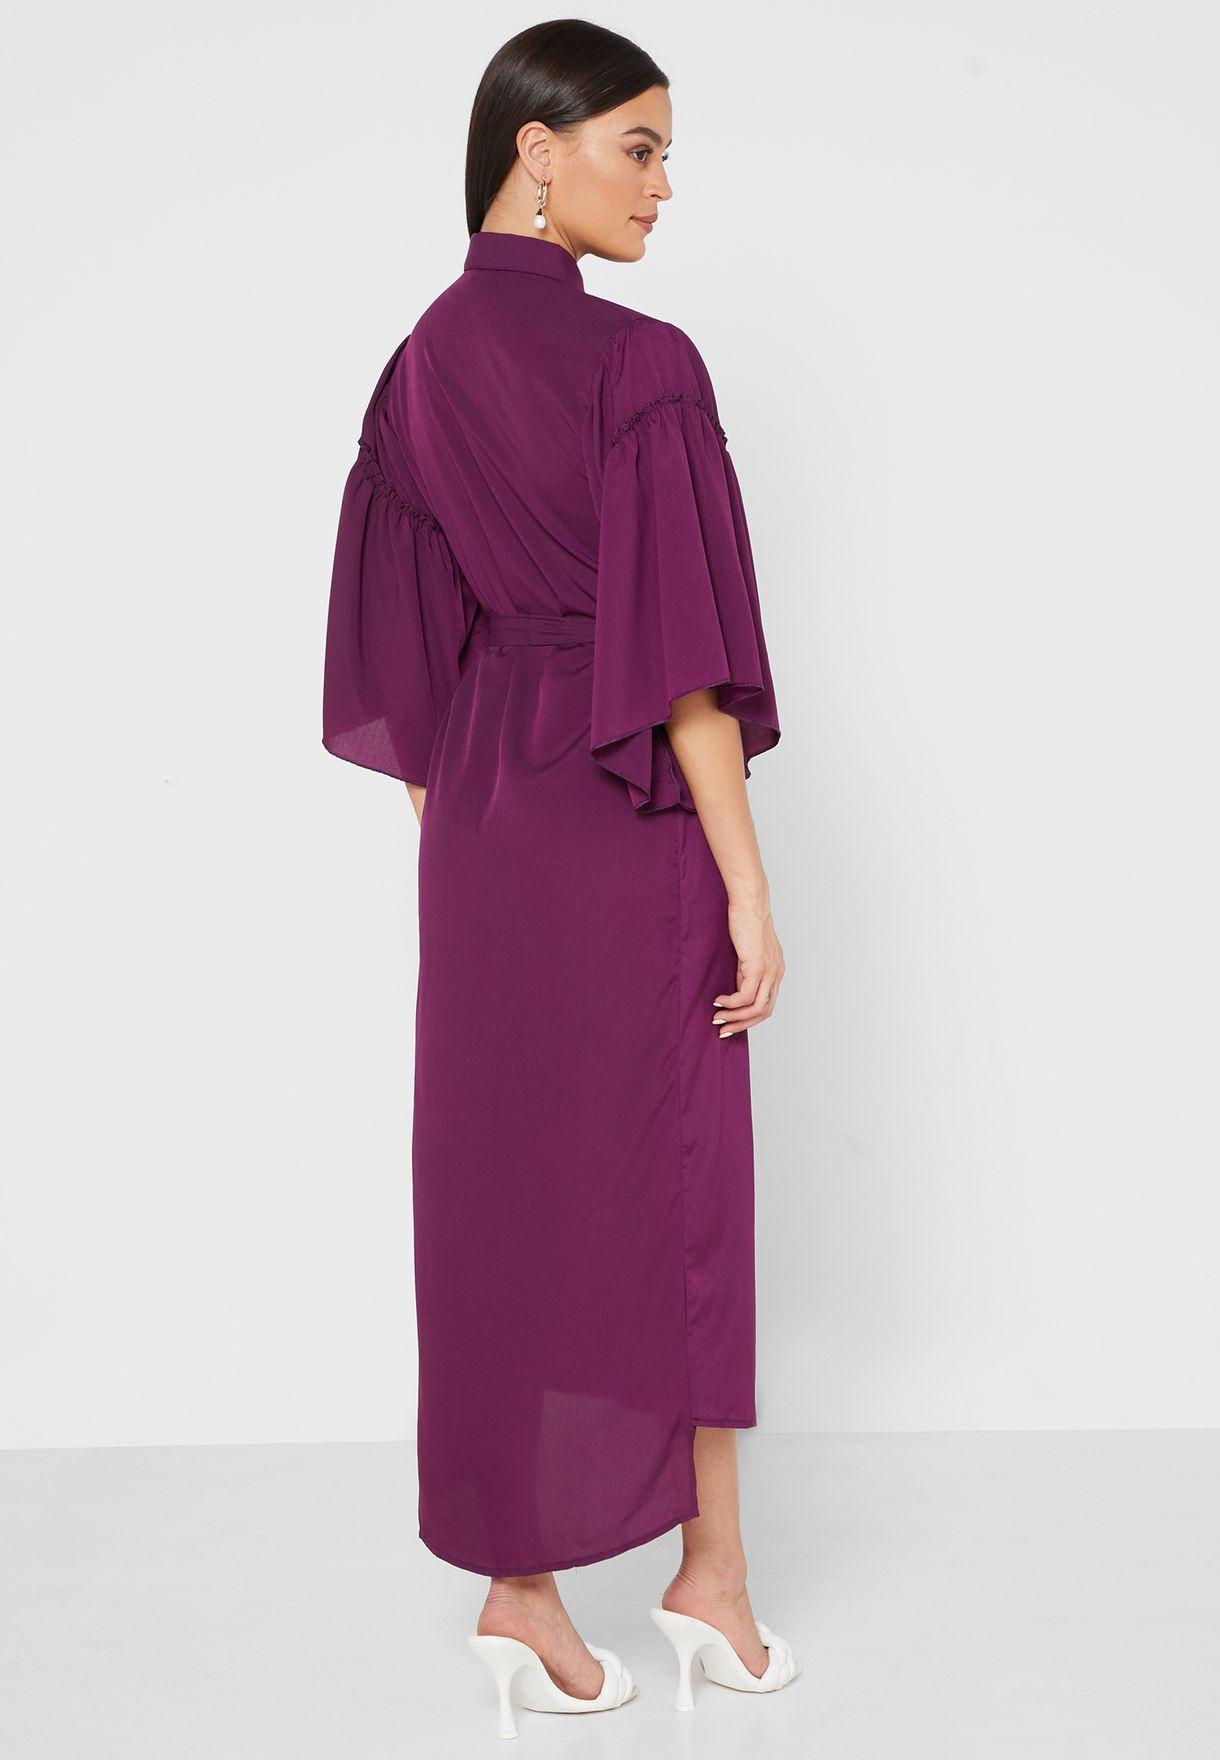 Ruffle Sleeve Self Tie Shirt Midi Dress